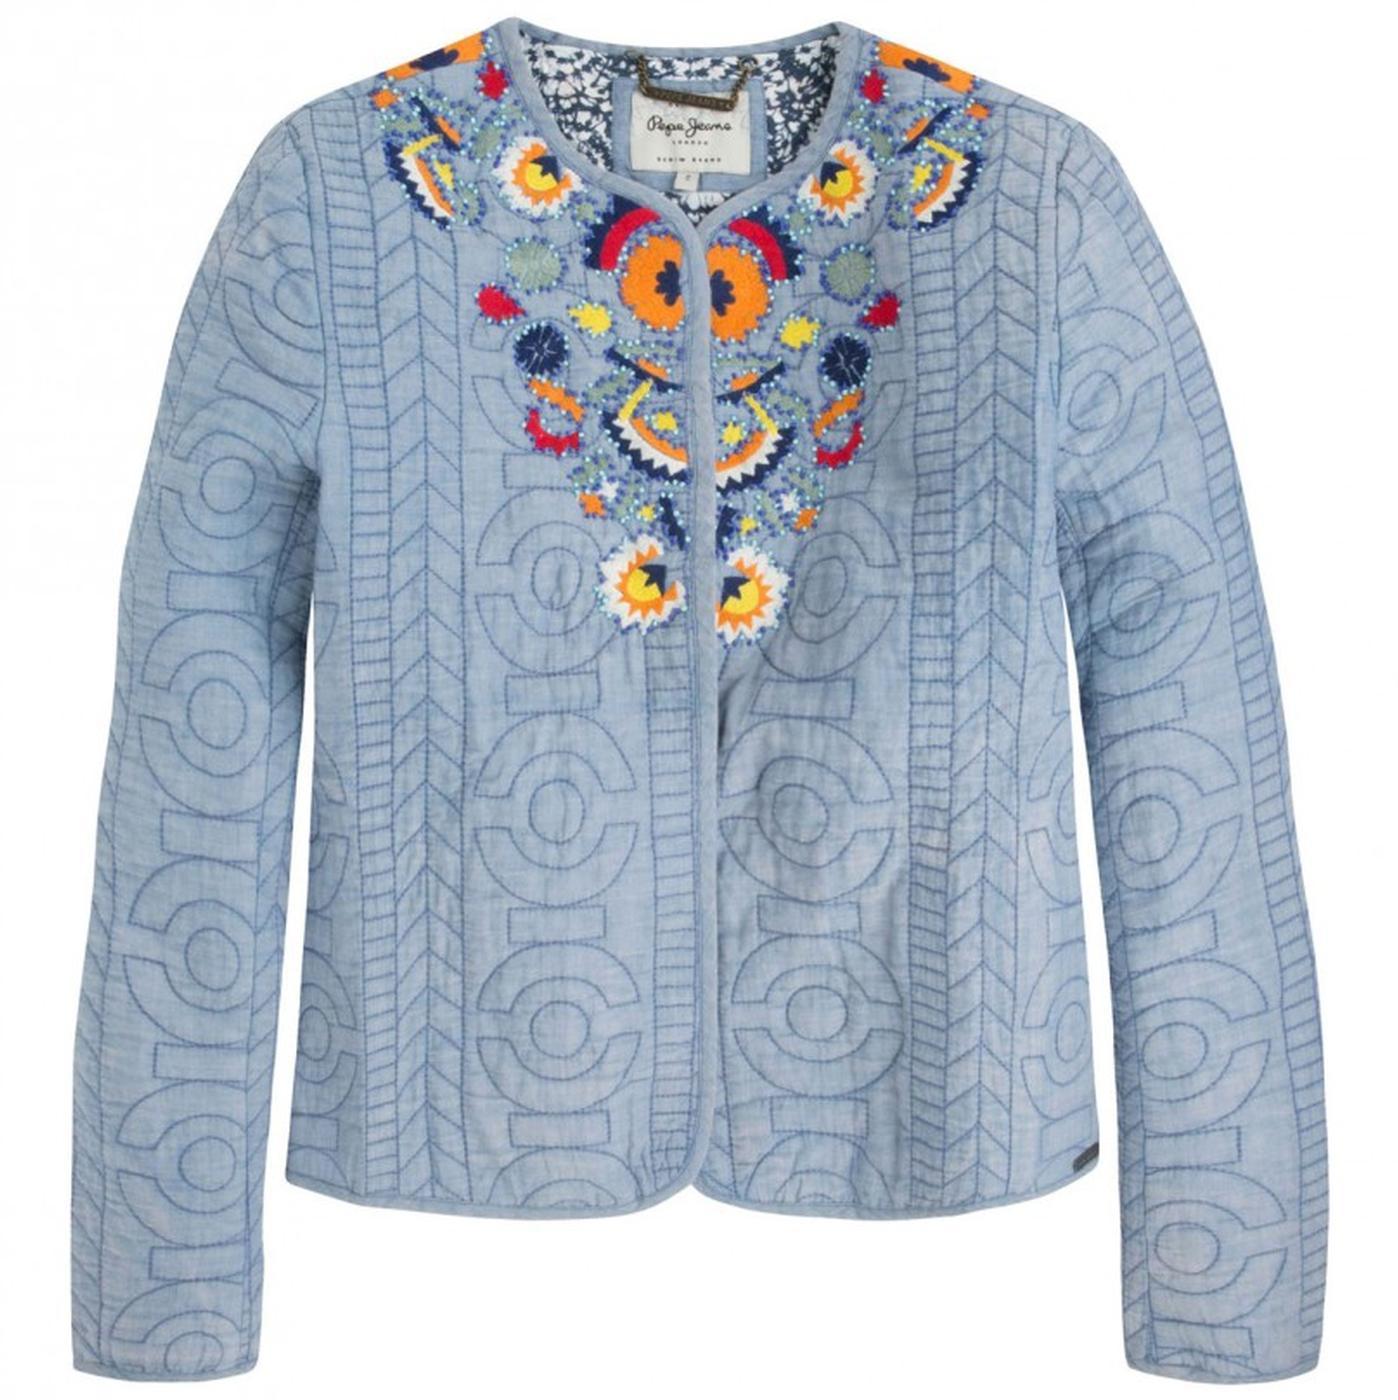 Best Place Online Womens Irene Long Sleeve Sweatshirt Pepe Jeans London Sale 100% Authentic Discount Best Wholesale tvAcuxrz